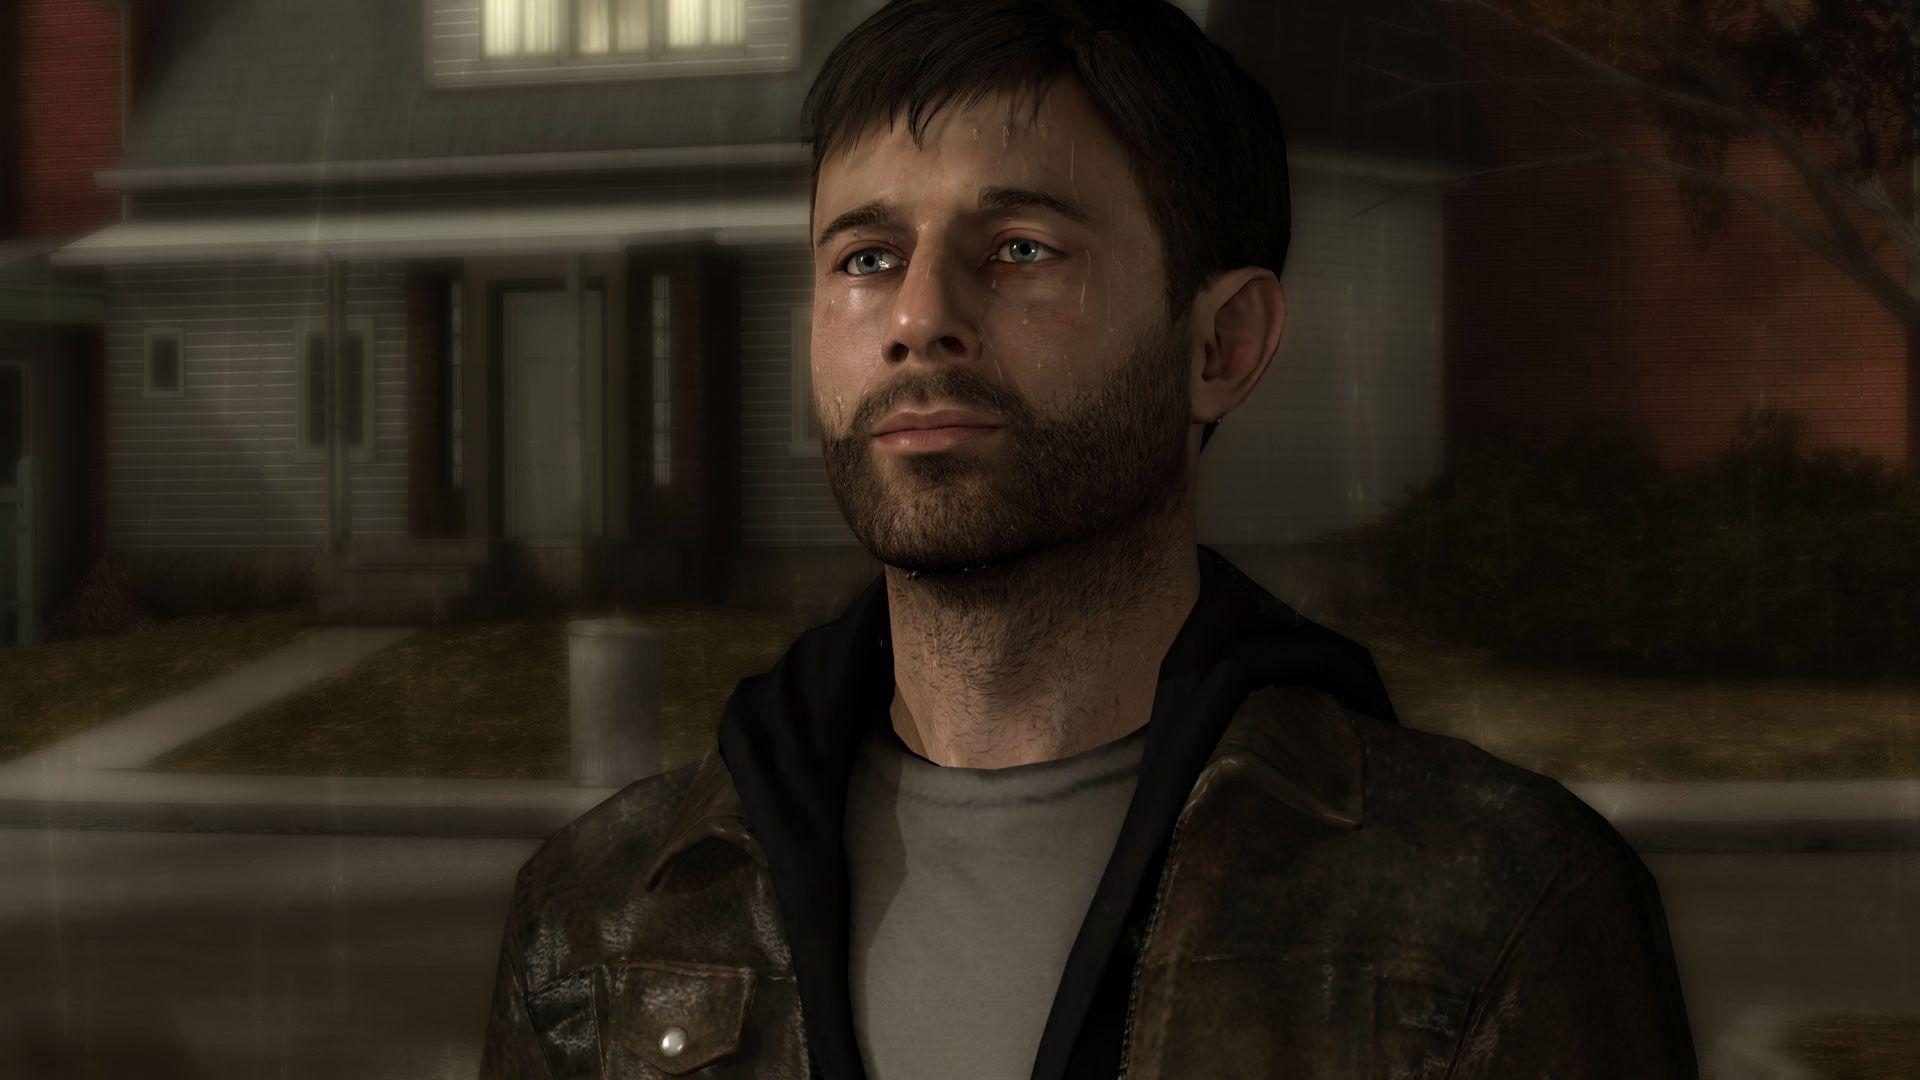 Heavy Rain - PS3 - First Look